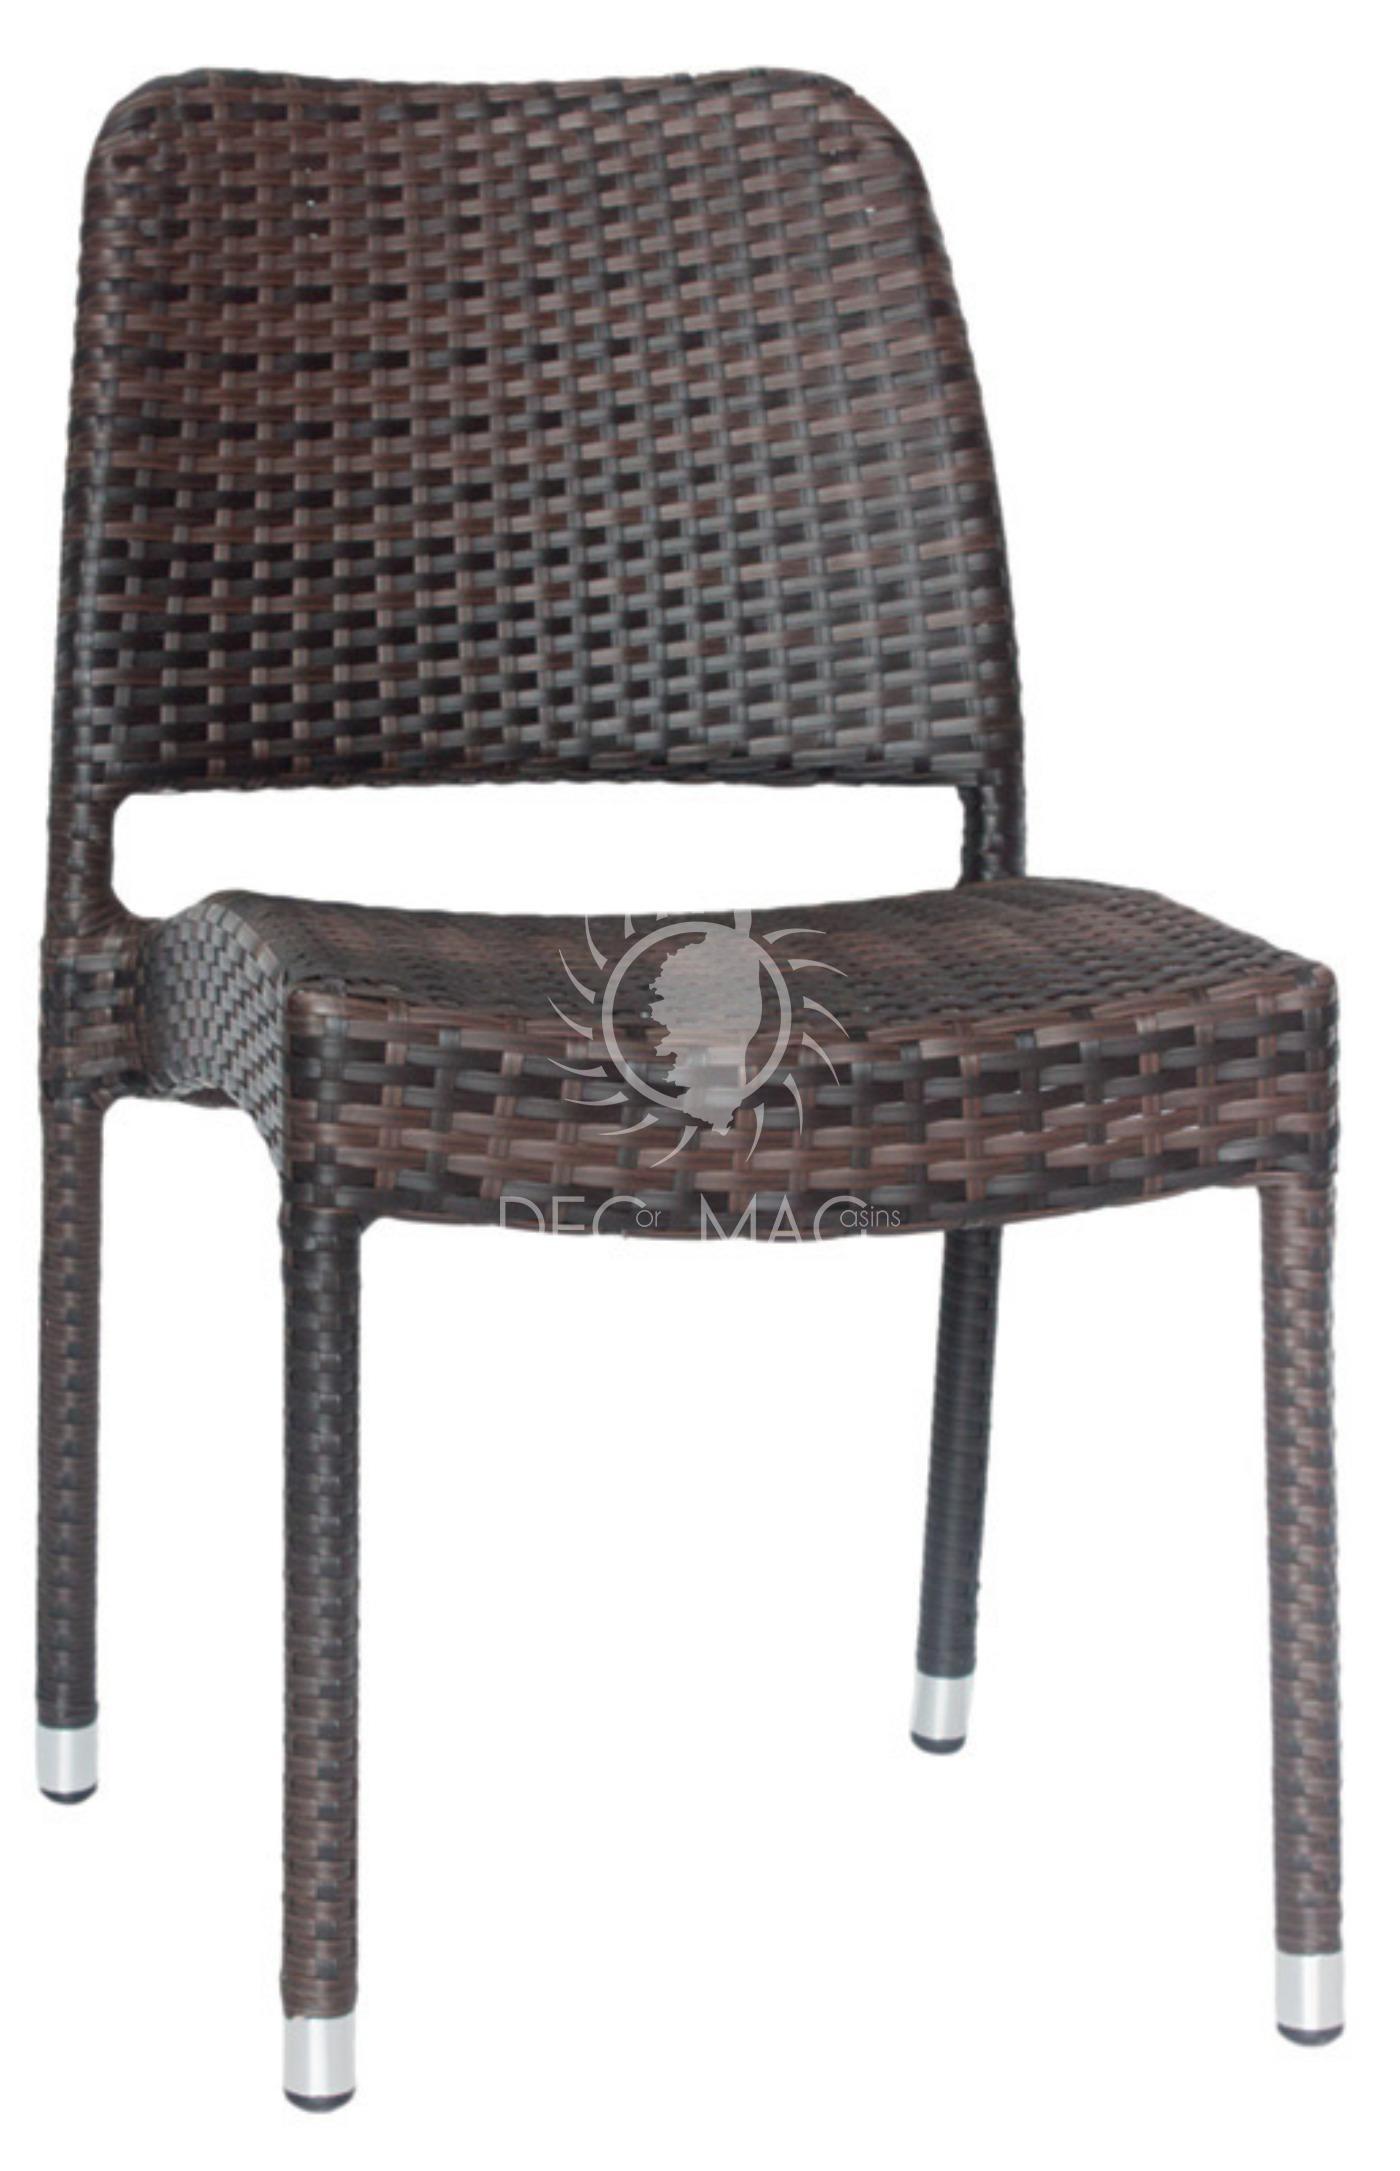 decor magasin vente chaise angy bastia en corse. Black Bedroom Furniture Sets. Home Design Ideas